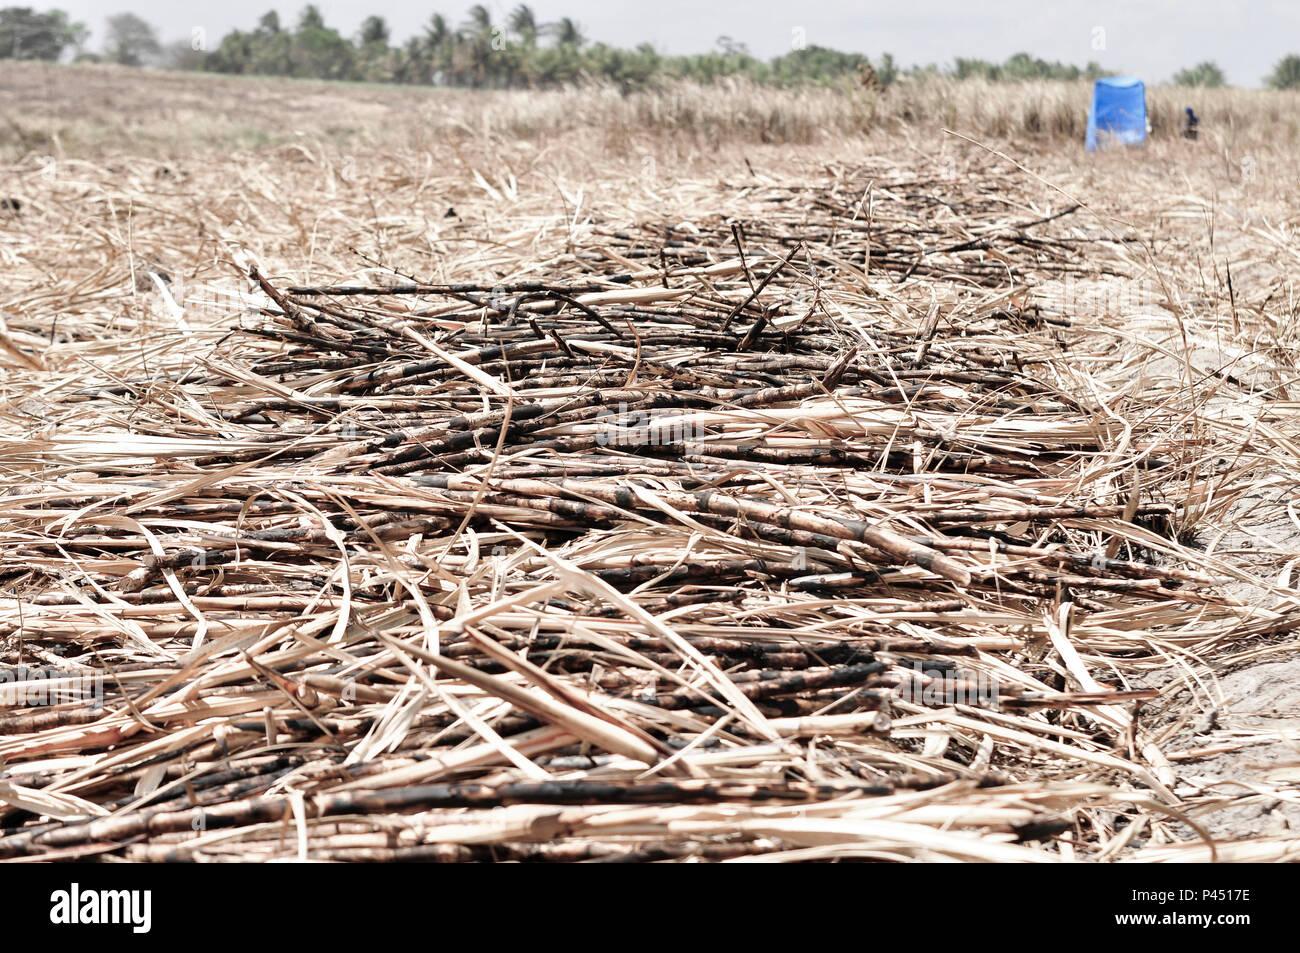 E Canaviais cortadores de cana. Na Estrada. Bahia-Brasil. 23/12/2012: (Foto: Mauro Akin Nassor / Fotoarena) Imagen De Stock